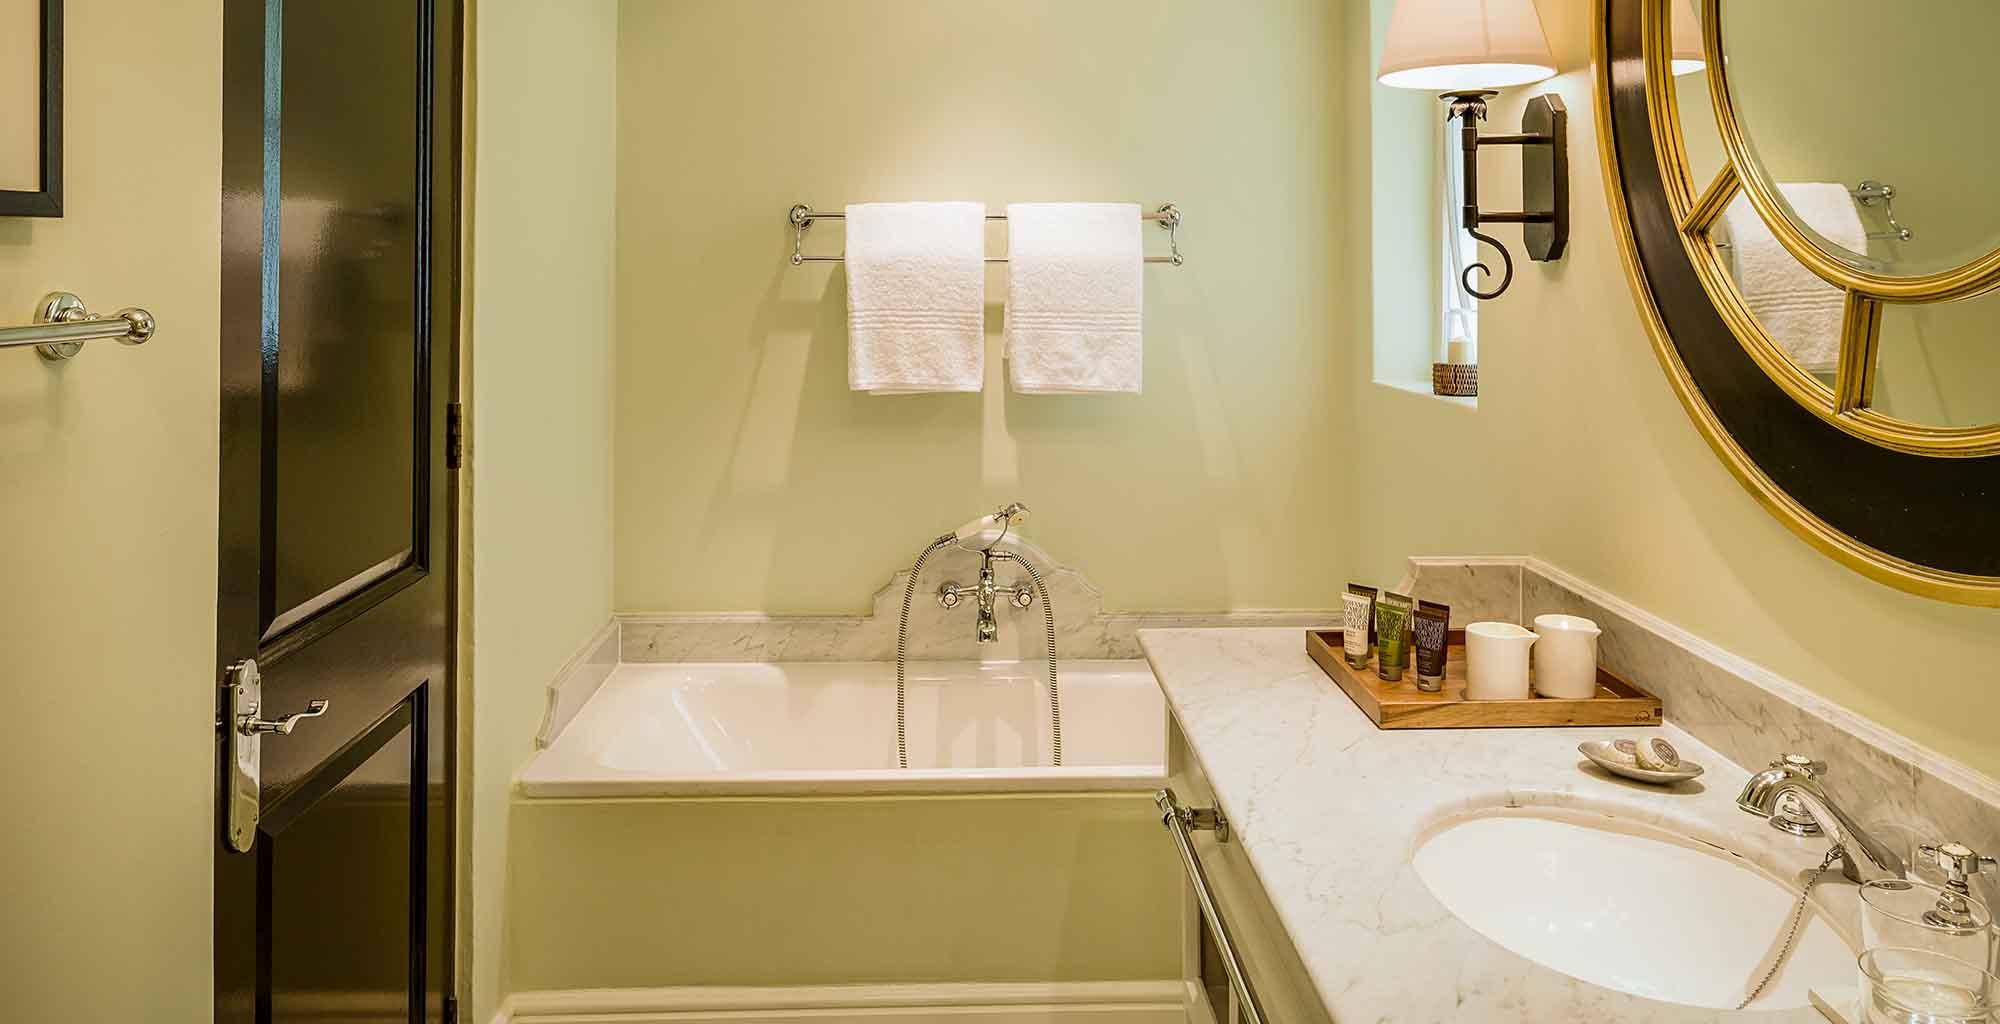 Zamnia-Royal-Livingstone-Bathroom